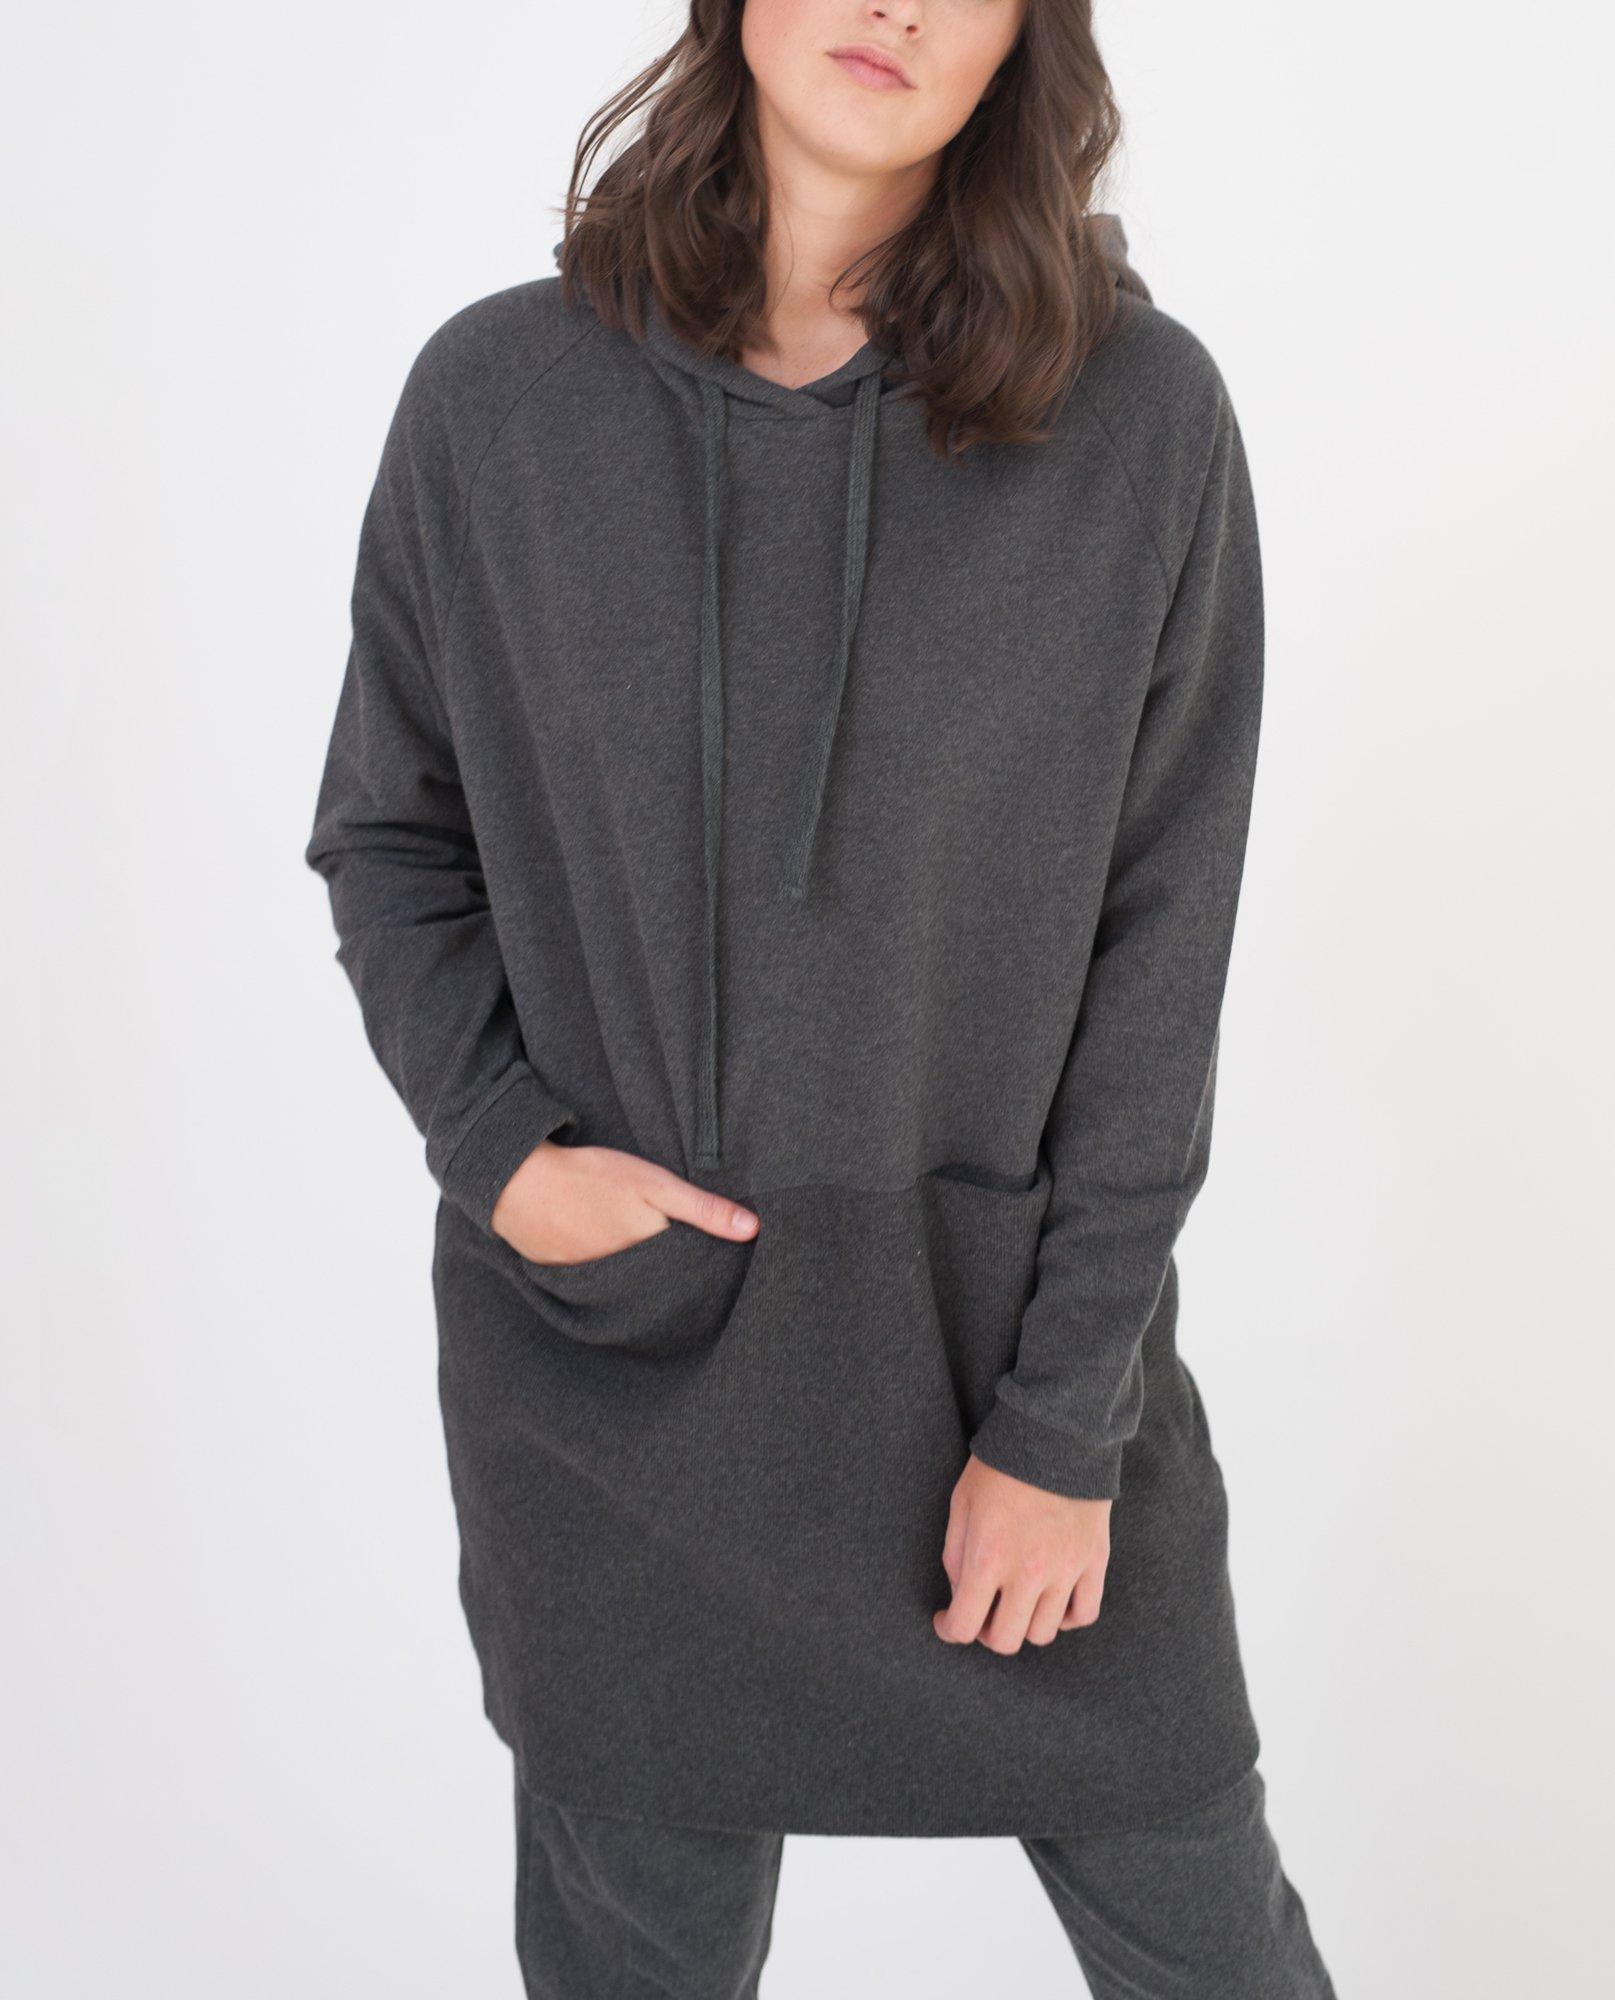 NOAH Organic Cotton Hooded Dress In Dark Grey from Beaumont Organic